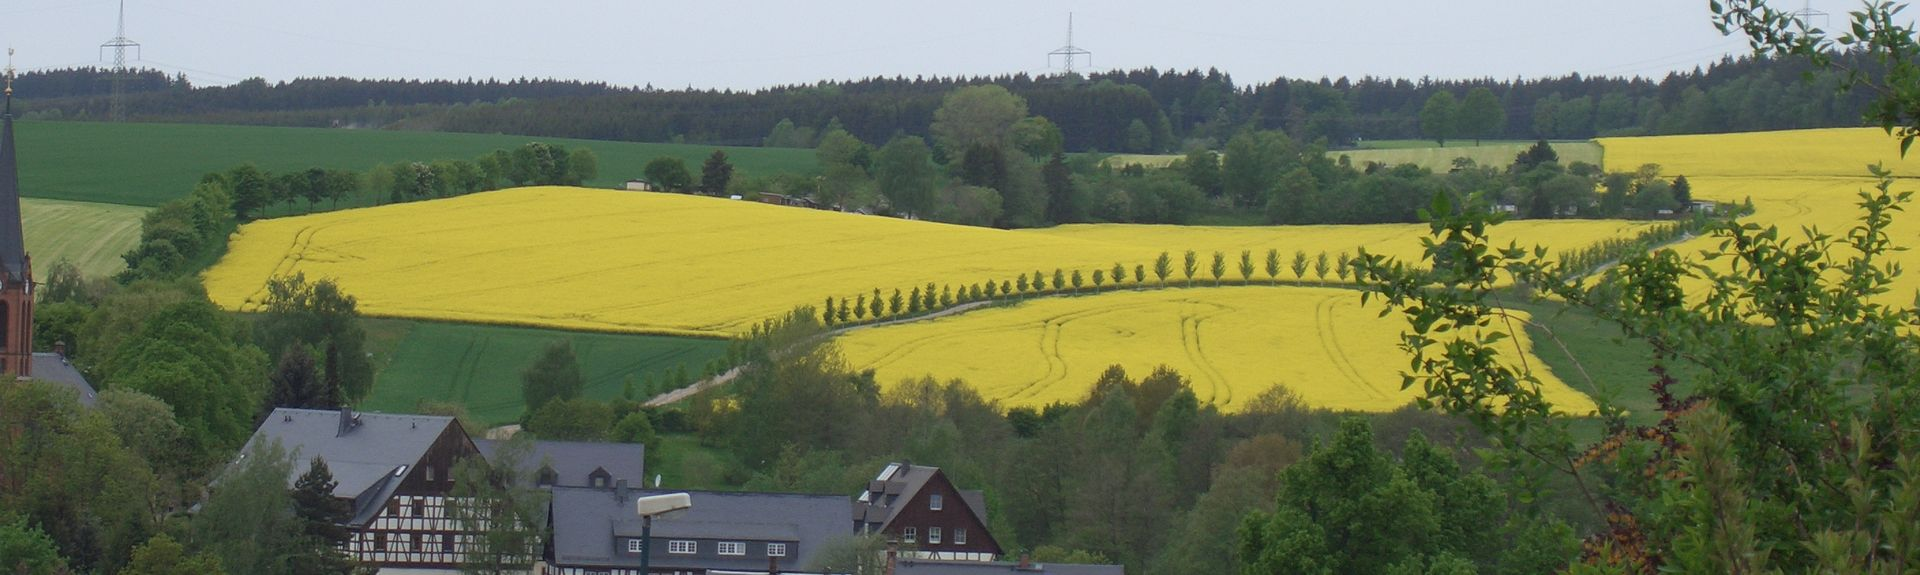 Niederdorf, Germany